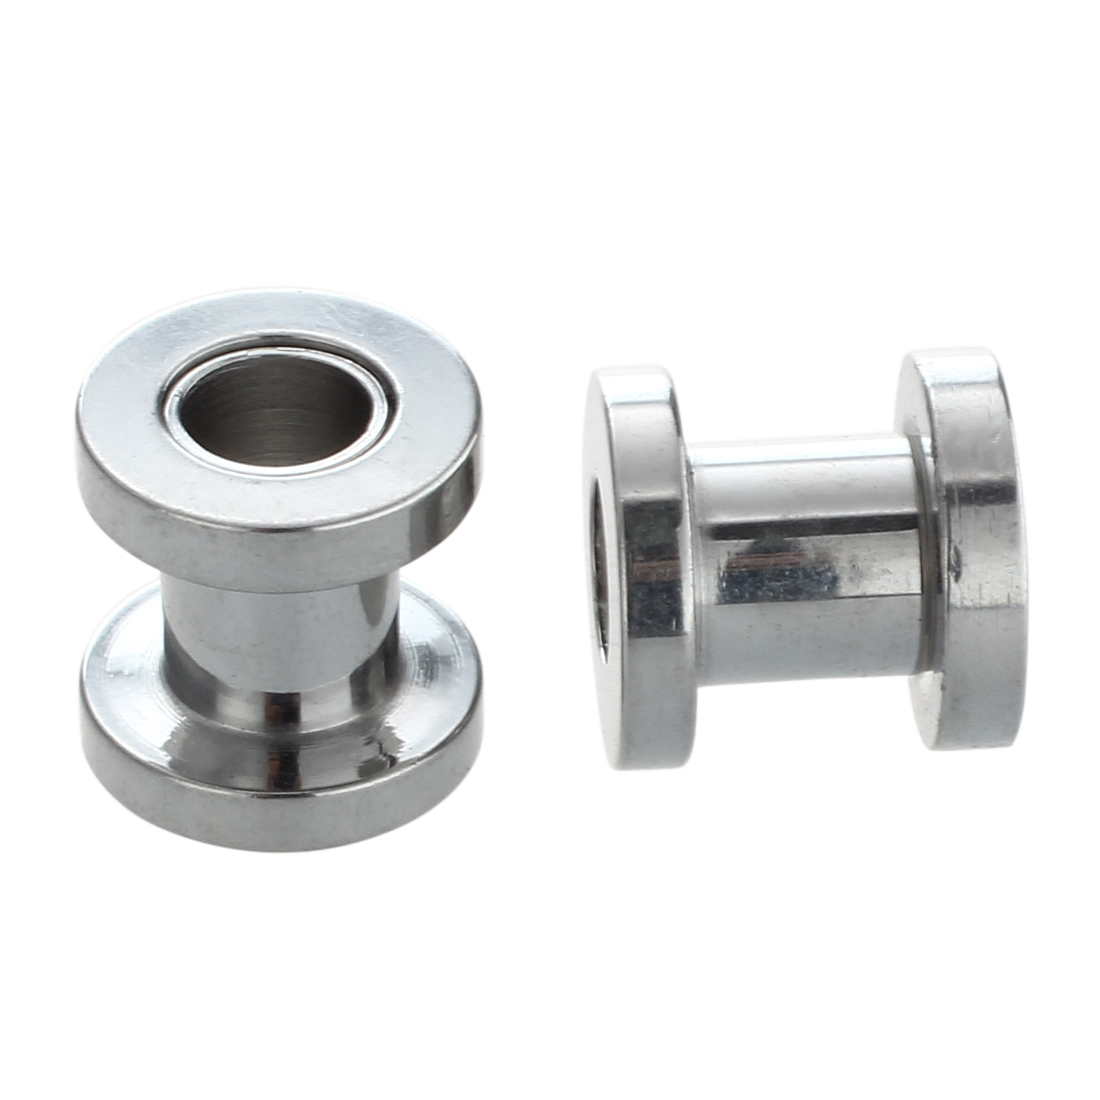 Disciplined Silver Steel Gauge Earring Punk Flesh Tunnel Ear Plugs Rimmed Flat Style Type:391 Agreeable Sweetness 6.5mm Rimmed Silver Tunnels Amount:pair